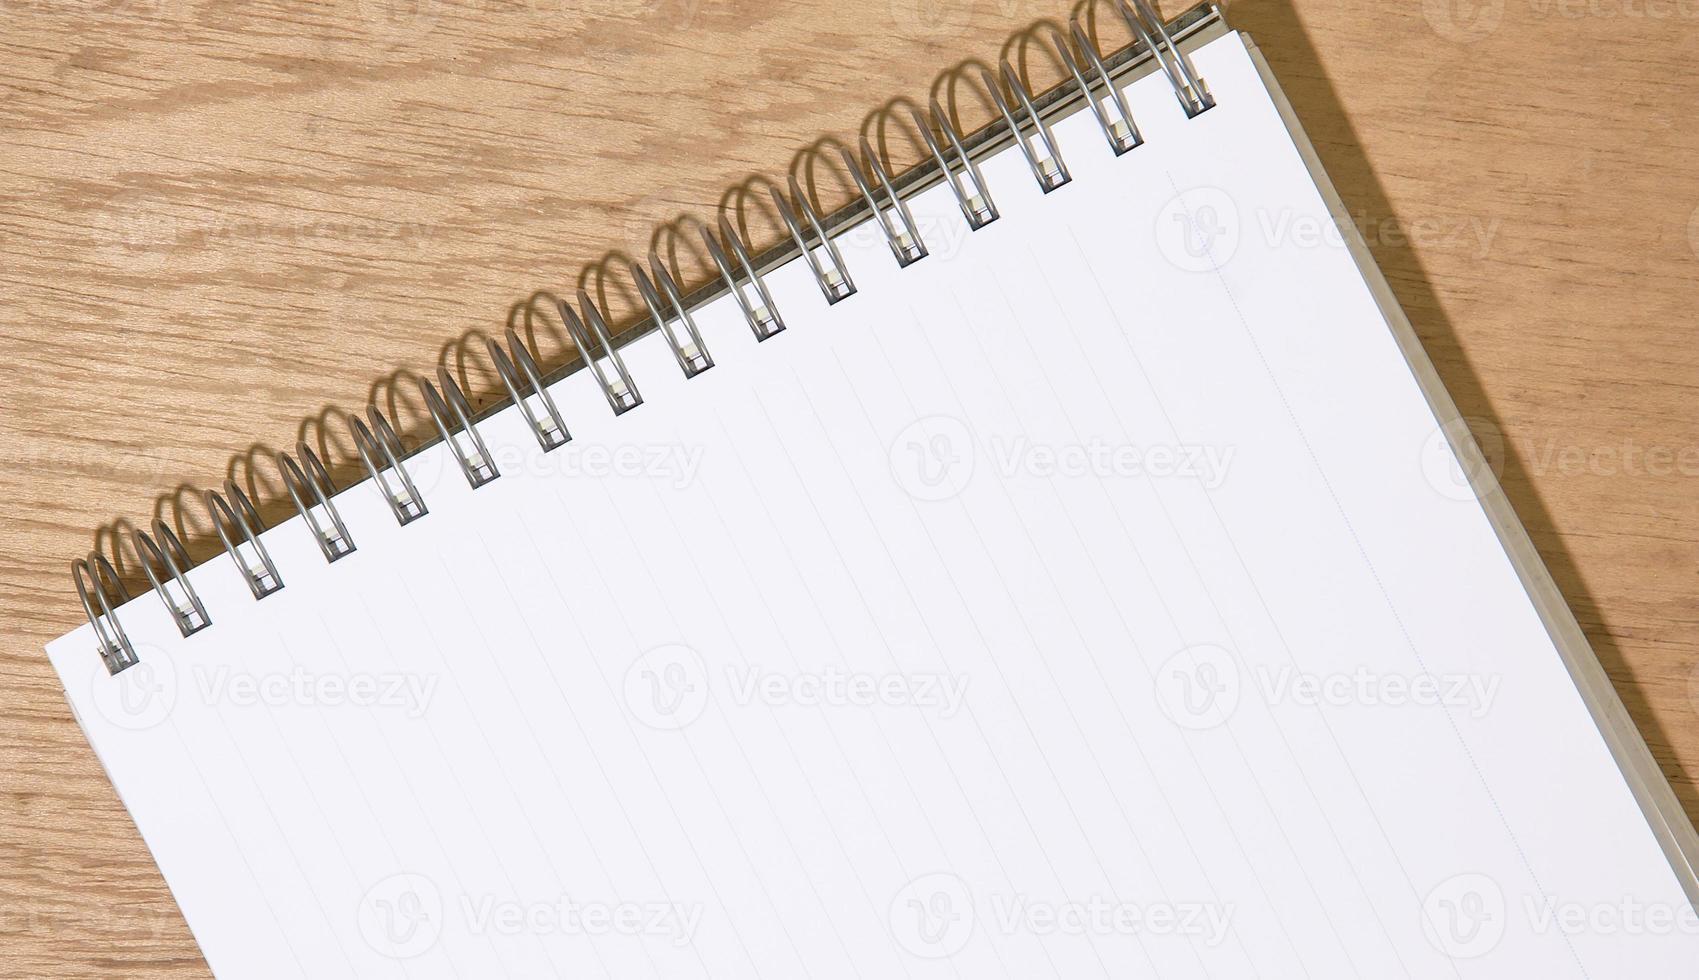 caderno aberto foto